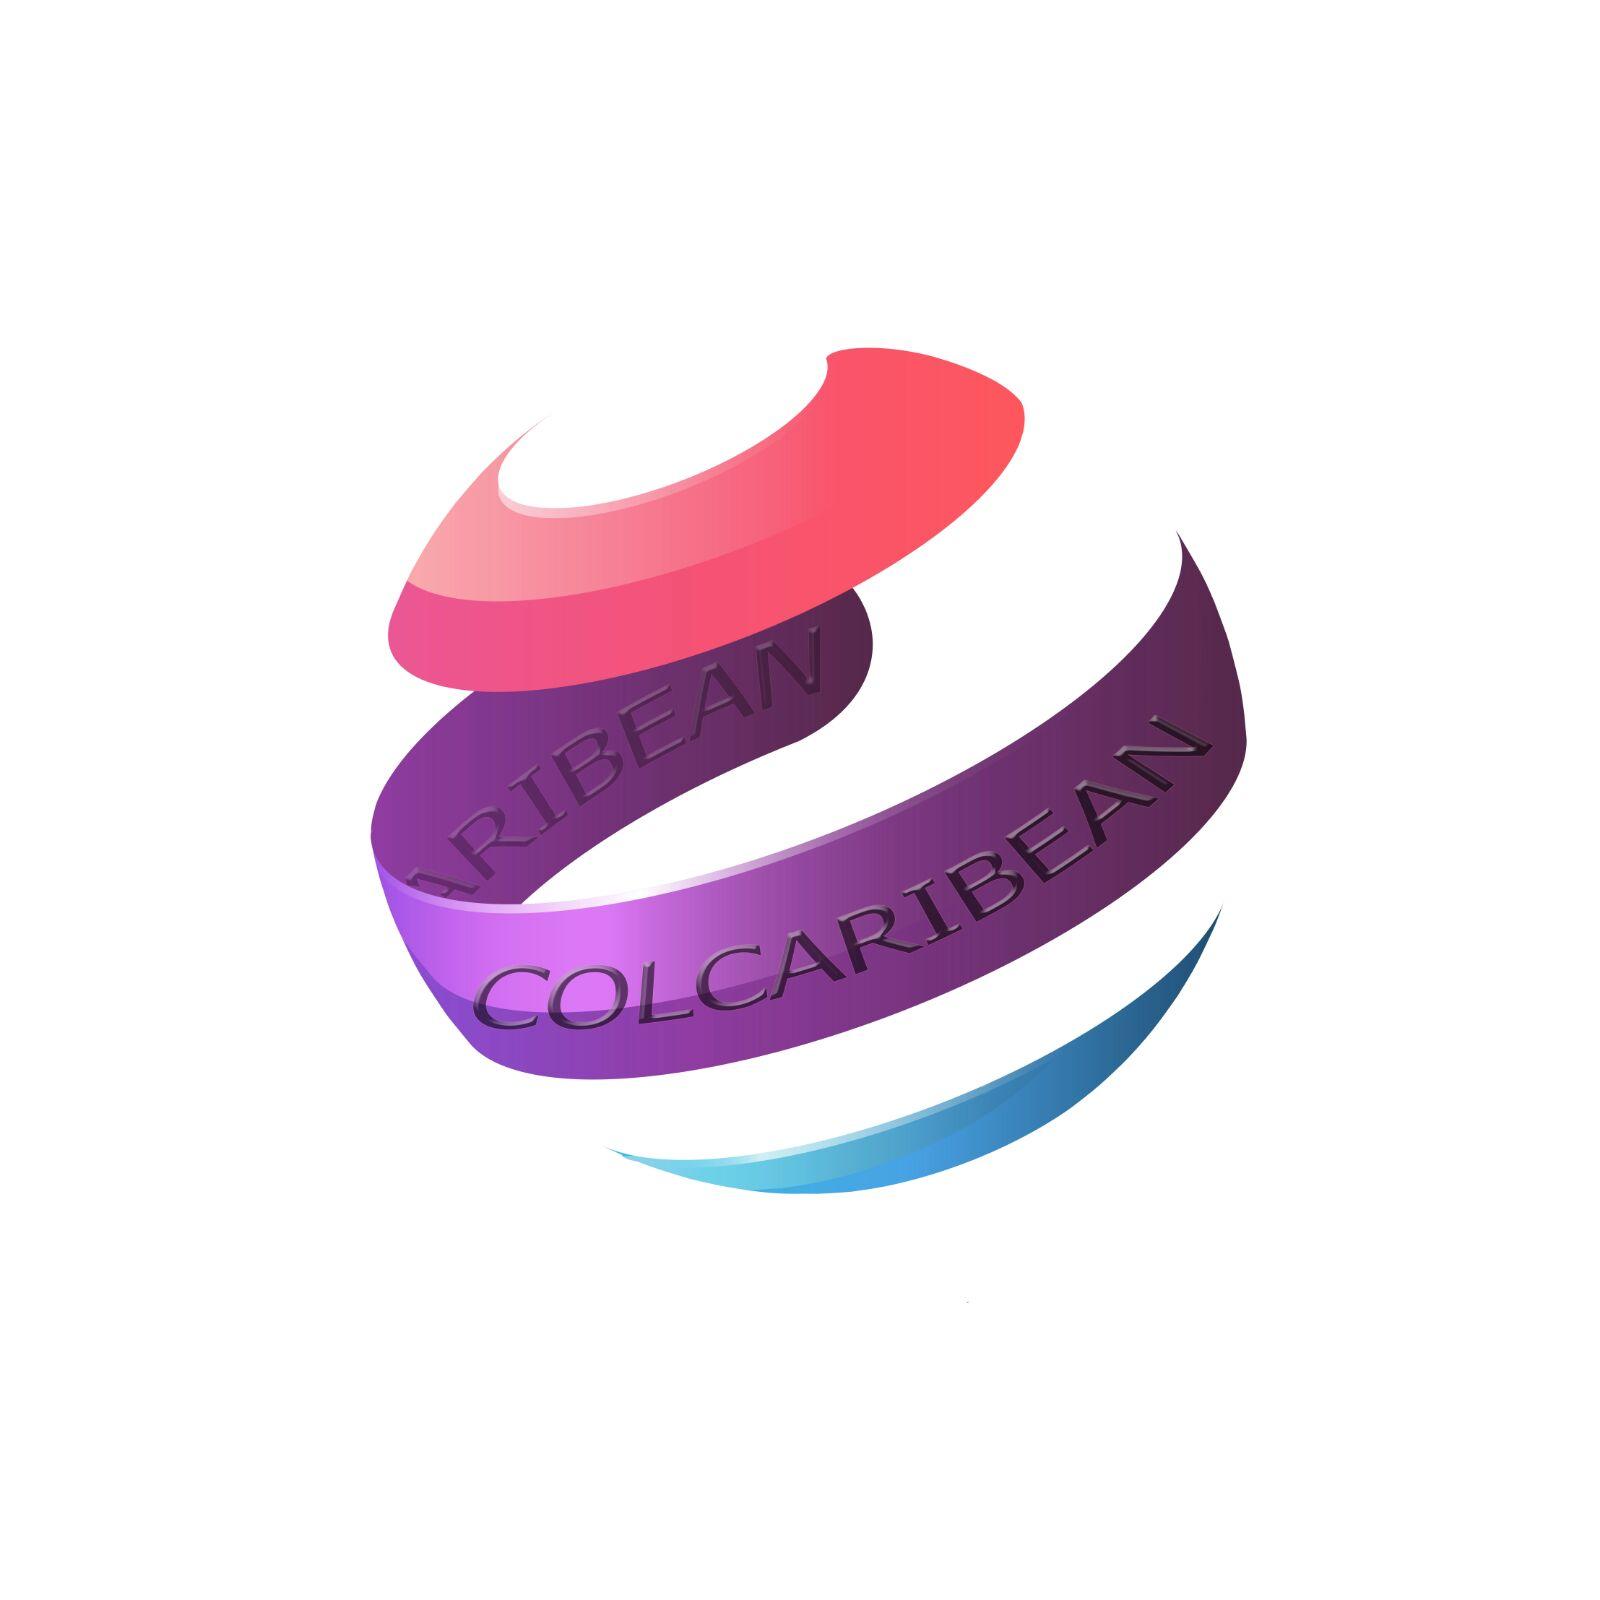 Colcaribean